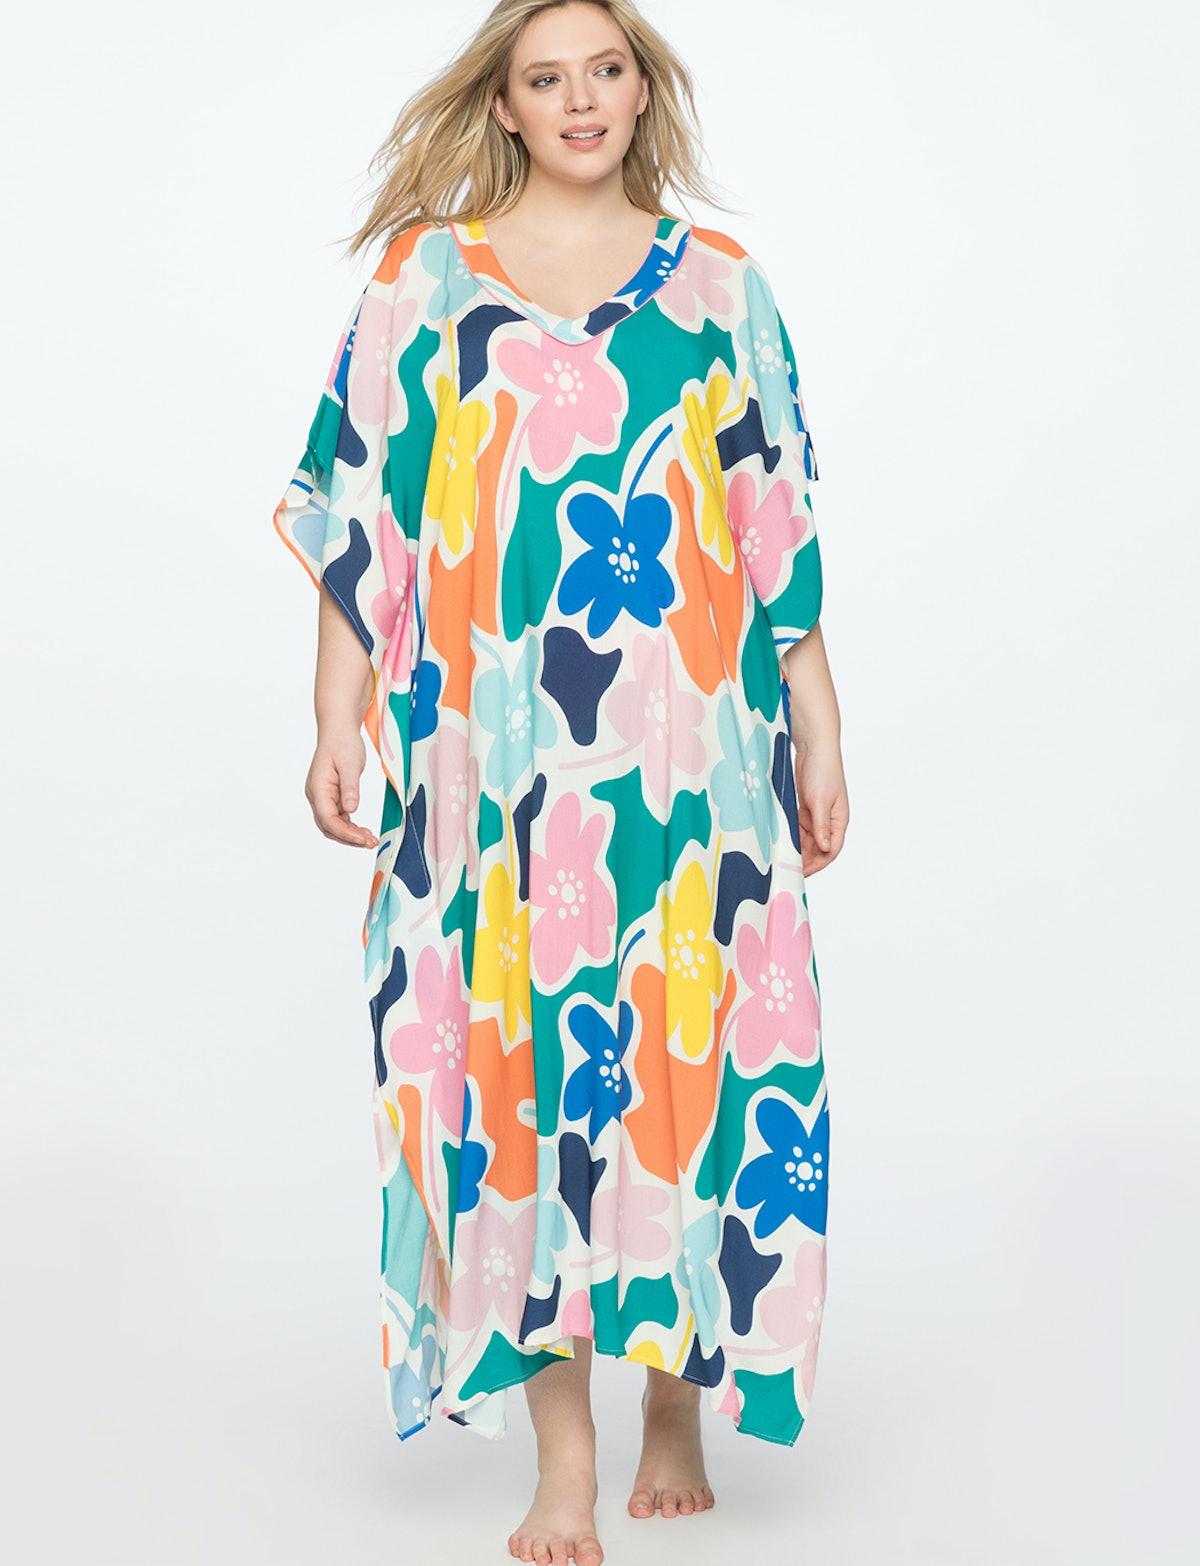 Kimono Maxi Dress Coverup